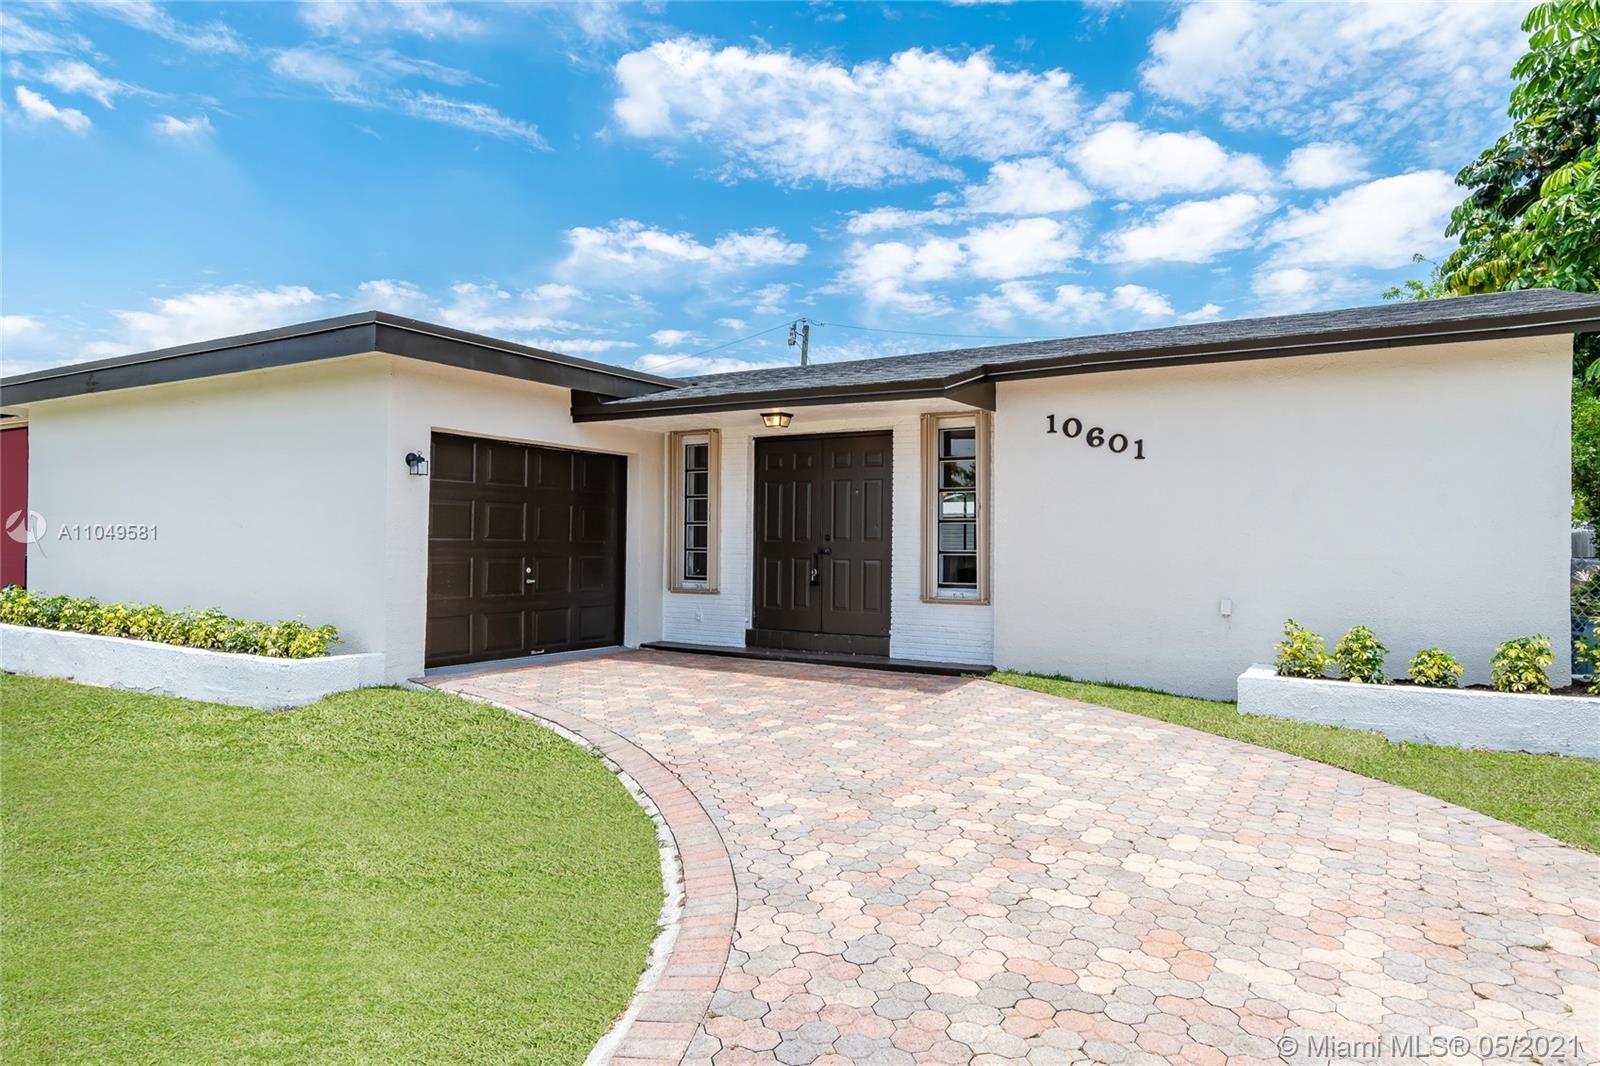 Sunrise Golf Village - 10601 NW 28th Mnr, Sunrise, FL 33322